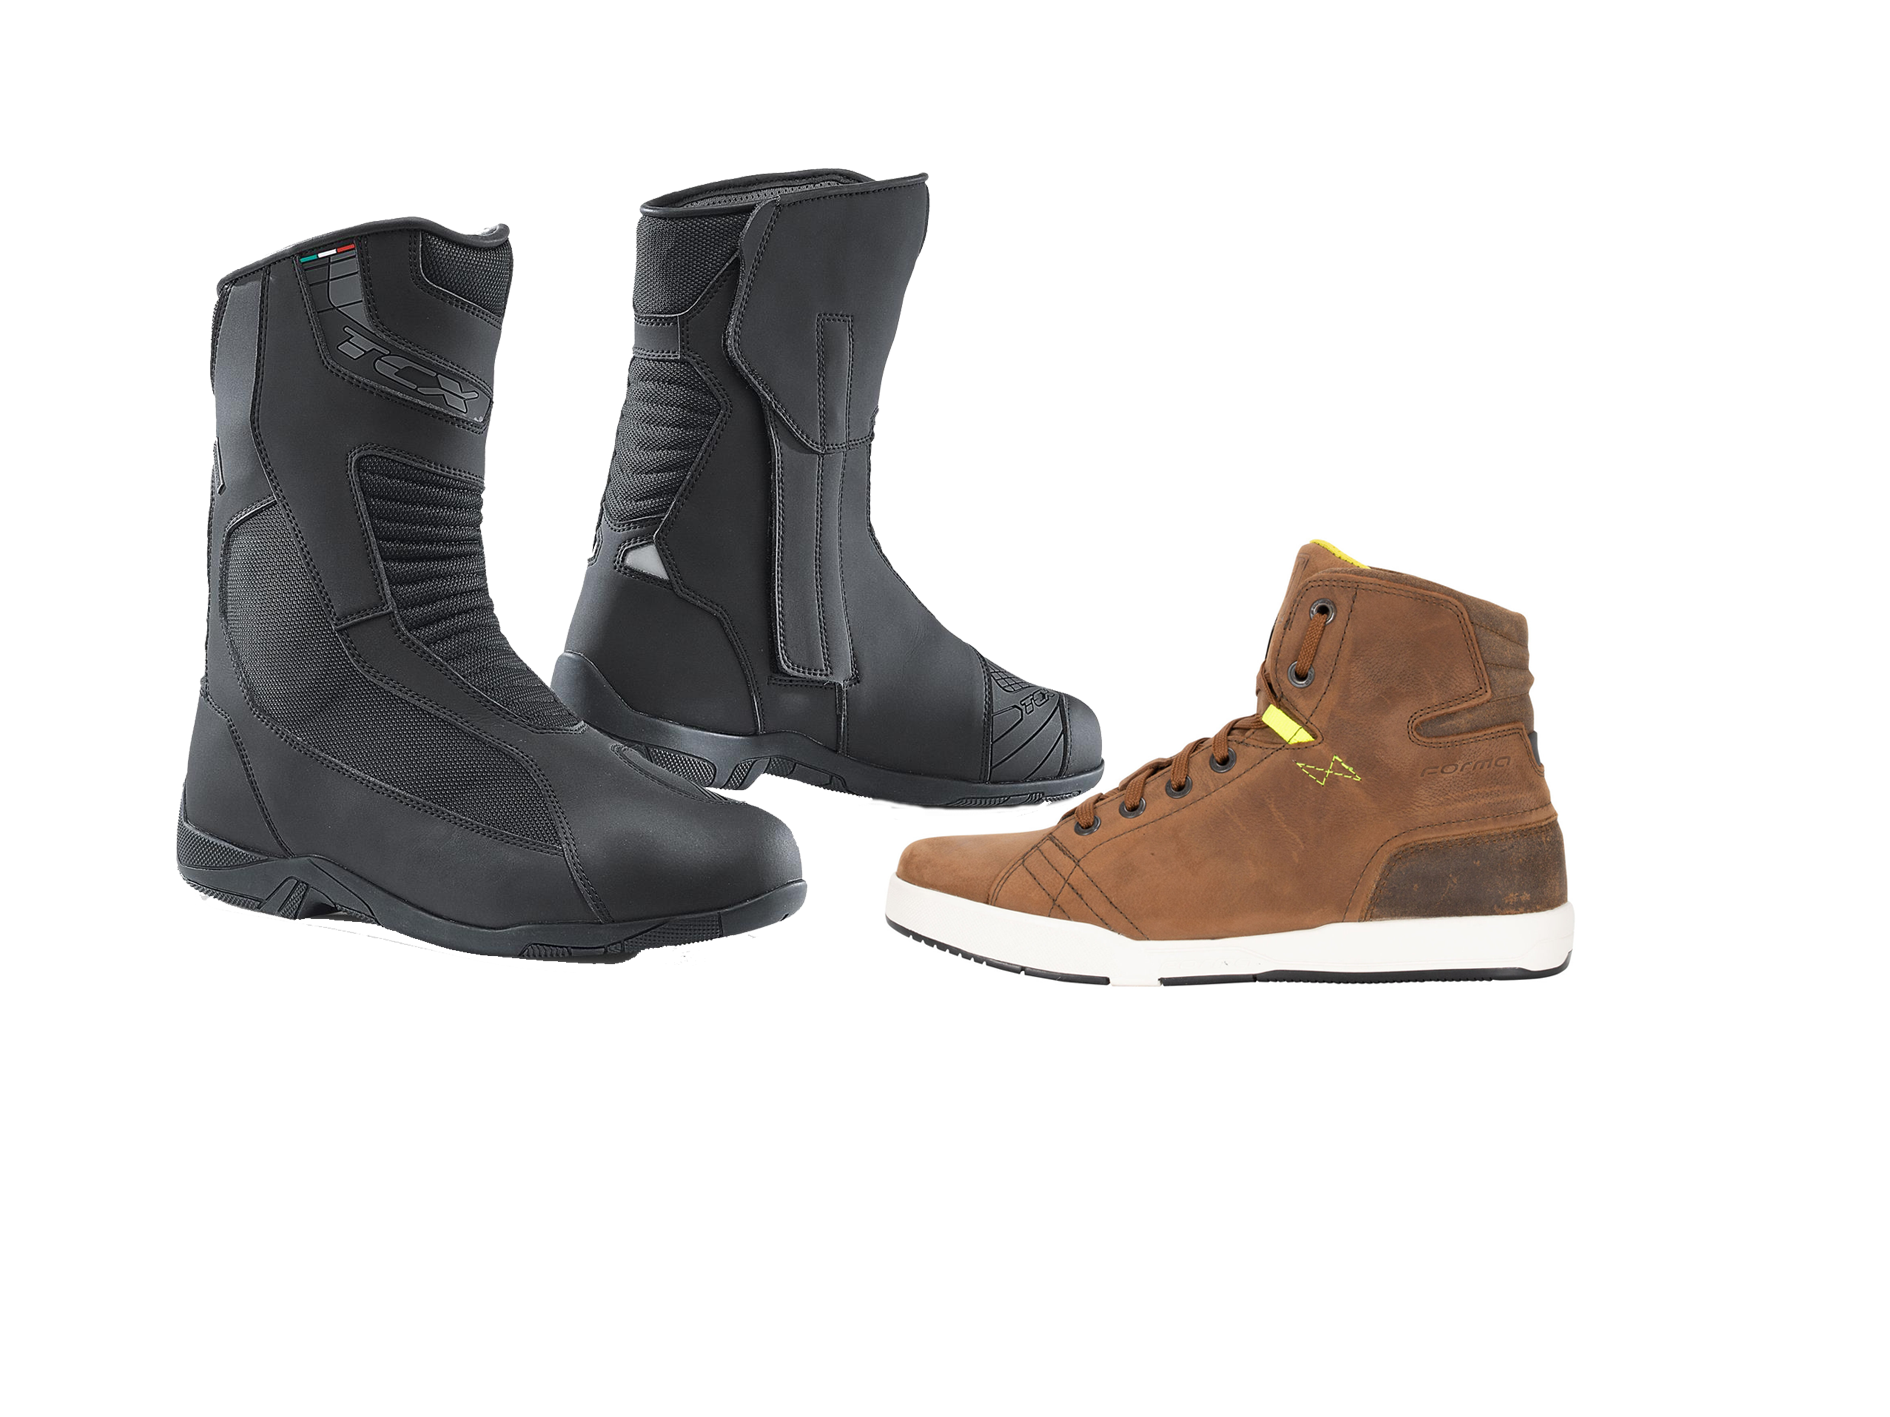 Bilde for kategori MC sko/støvler